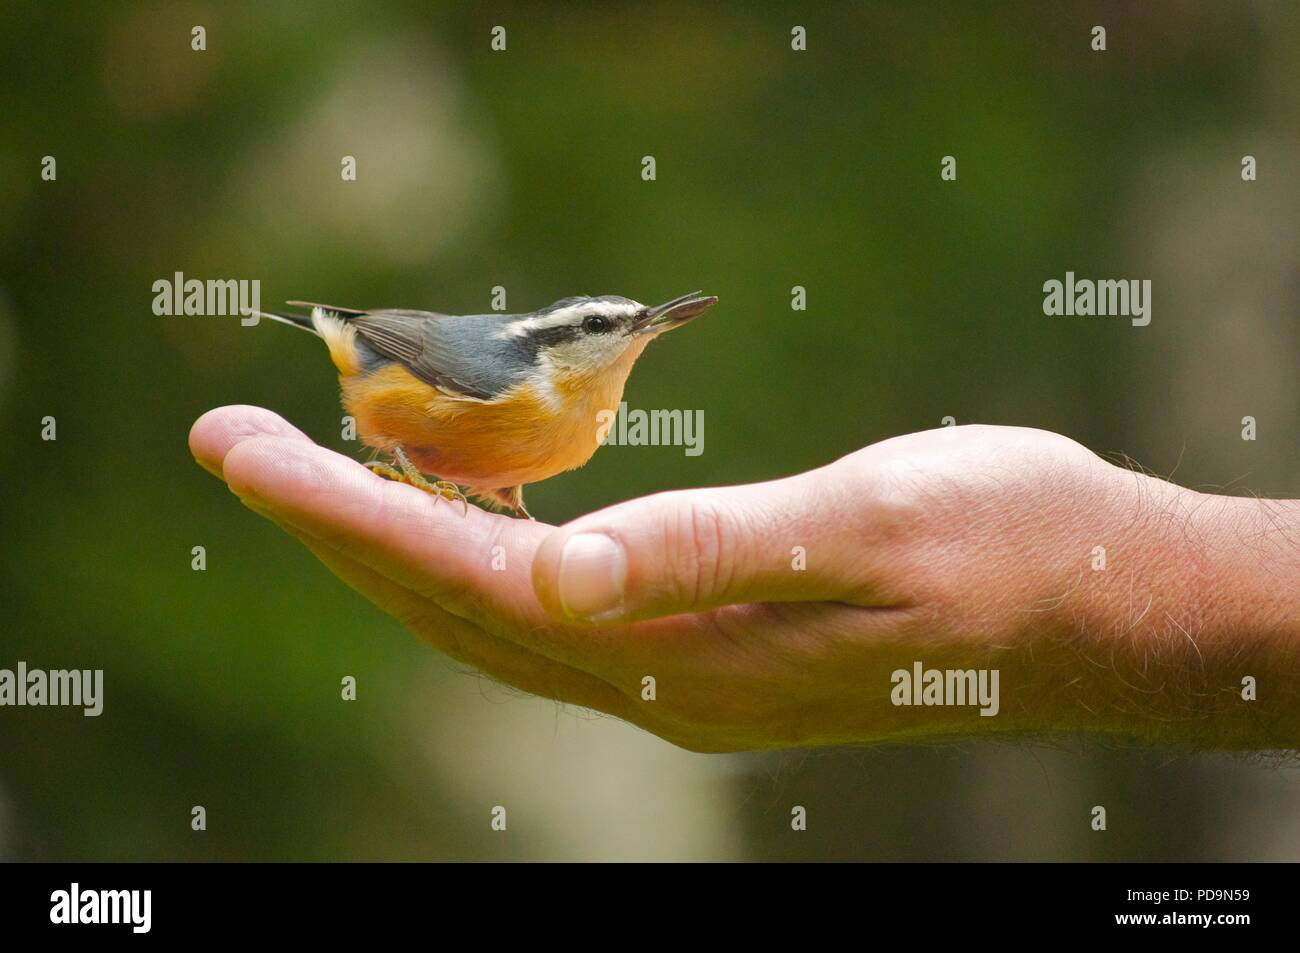 Vogel in der Handfläche (Red-breasted Kleiber (Sitta canadensis) (Vogel saß in someones Hand) (Vogel) (Hand feeding Vögel) Stockbild